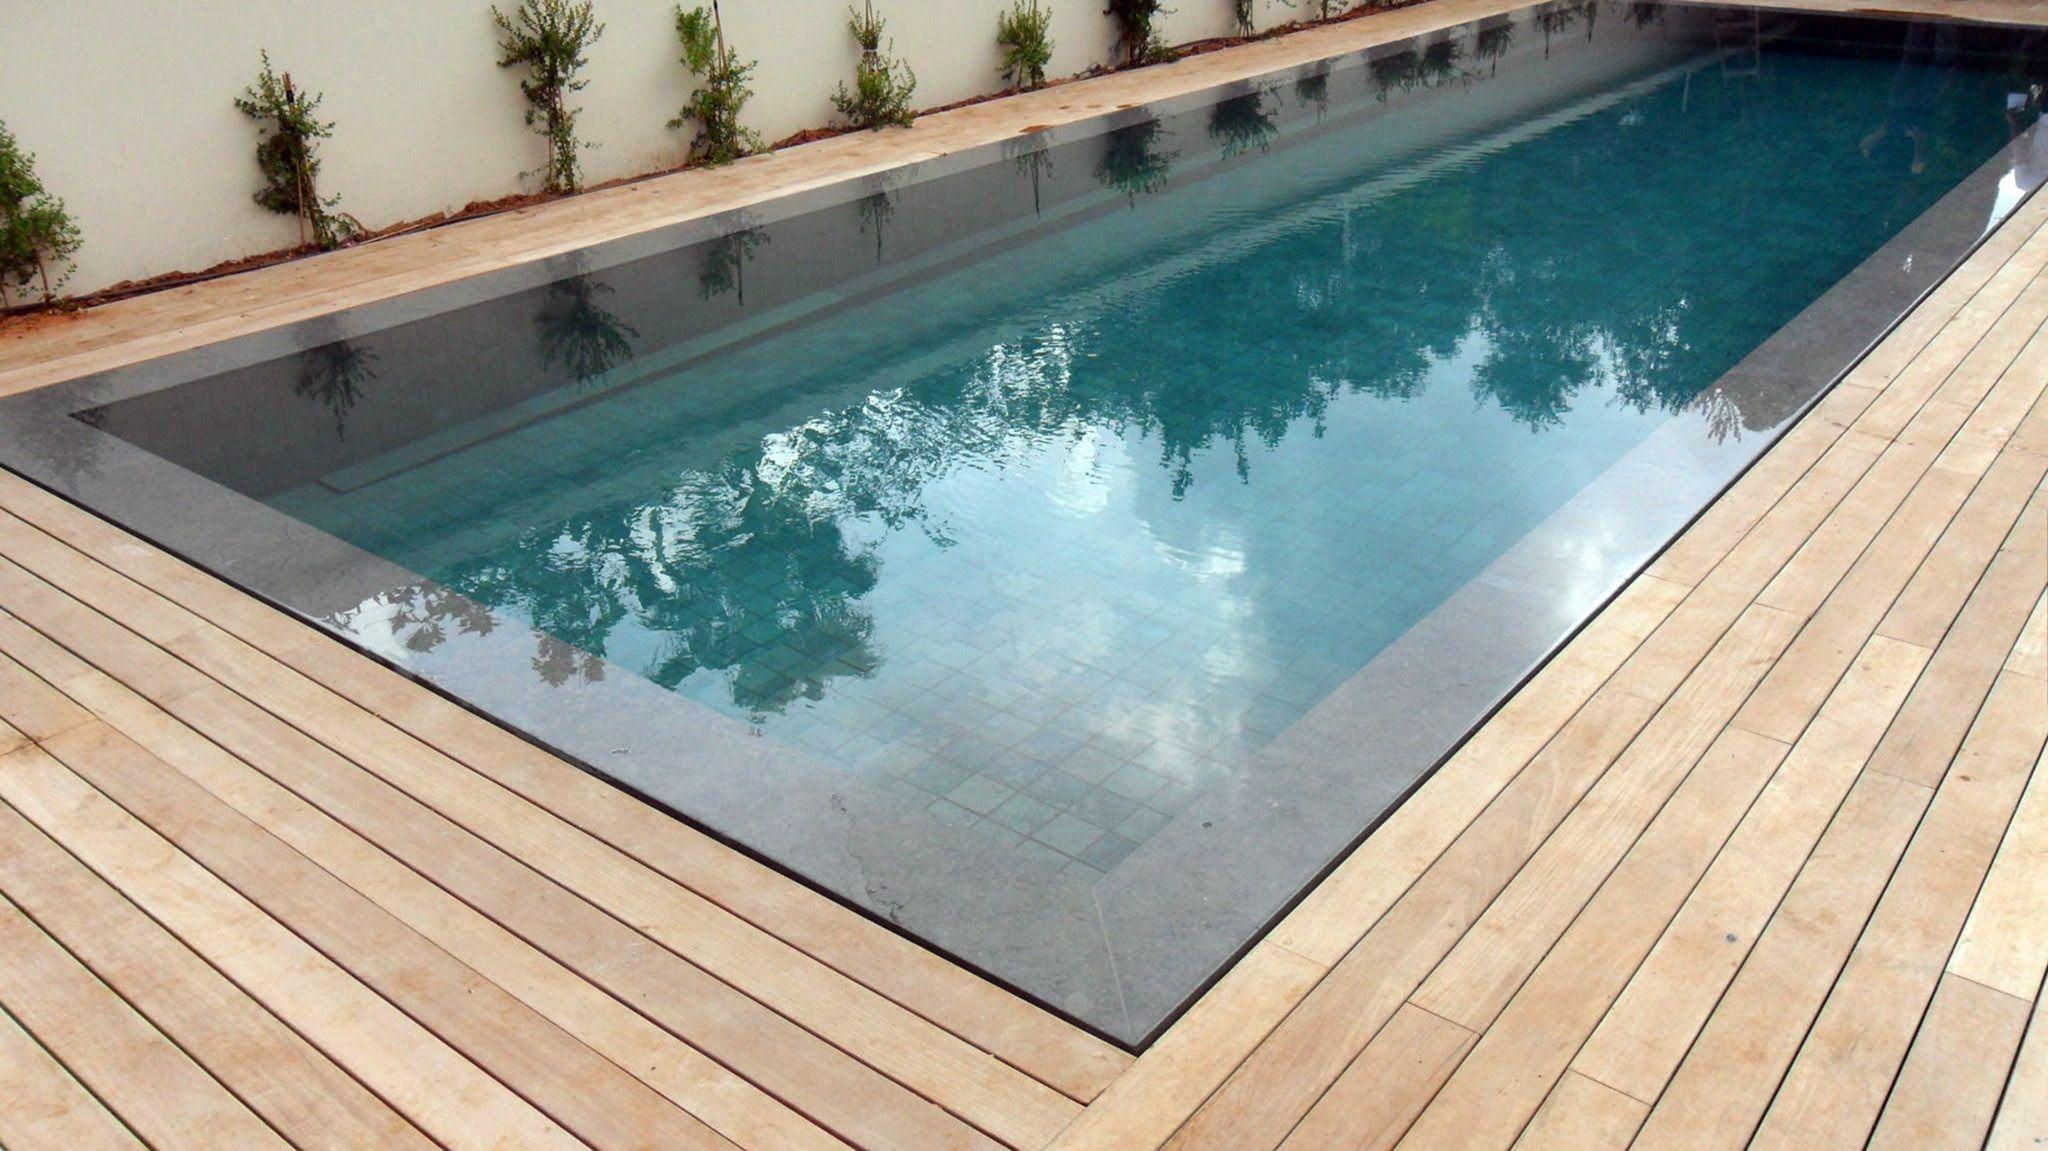 15 Stunning Above Pool Wooden Deck Design Ideas Wood Pool Deck Pool Decks Pool Landscaping